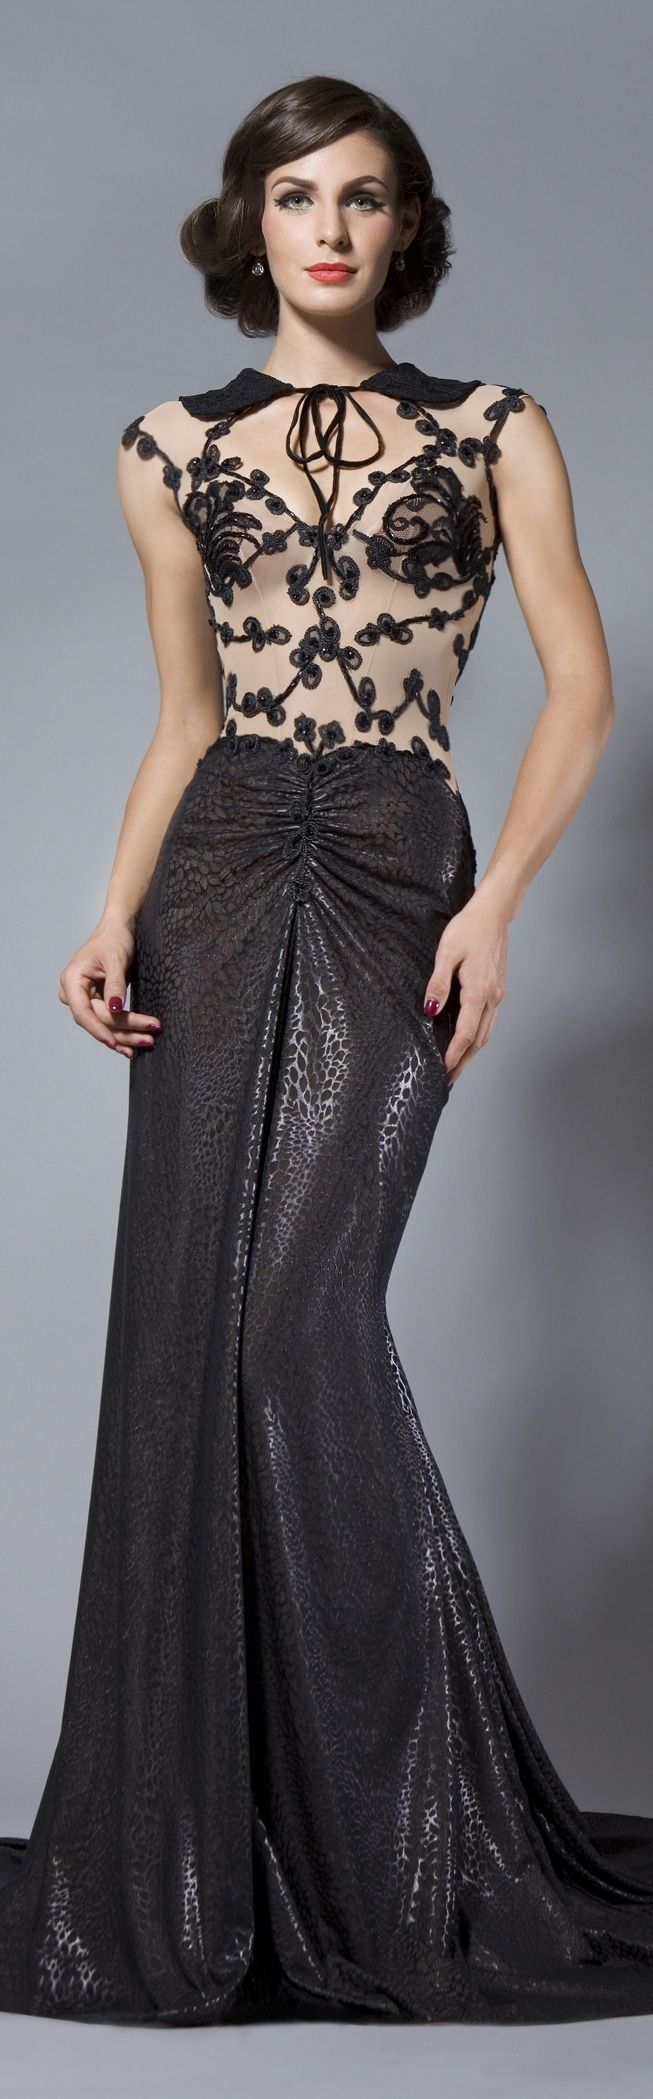 Rochii de Seara - Colectia Velvet AngelsFashion Couture, Fashion Clothes, Fashion Chic, Velvet Angels, Colectia Velvet, De Seara, Angels 2013, Dresses, Lace Dresses